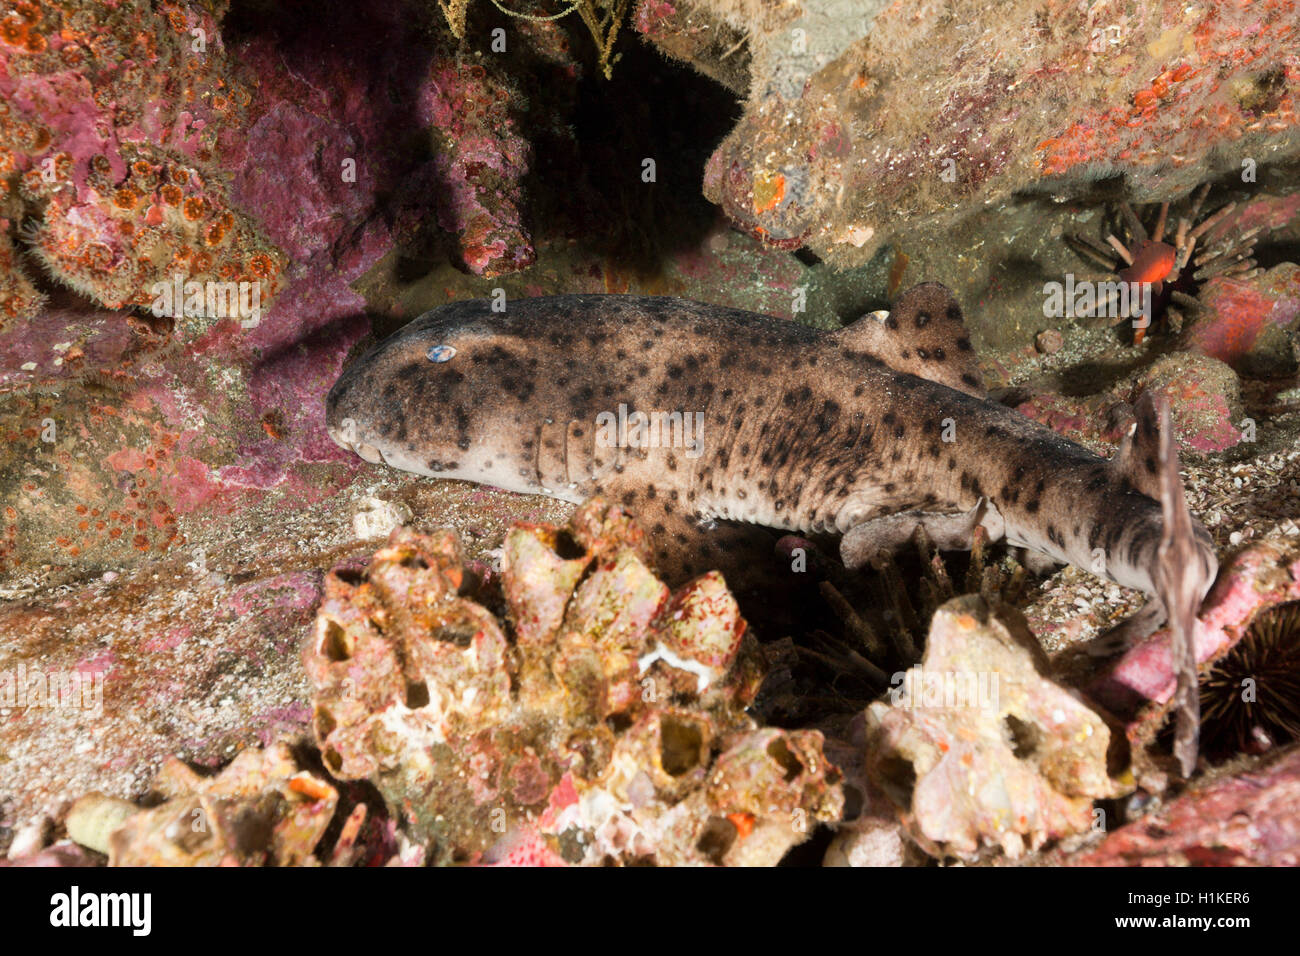 Galapagos Bullhead Shark, Heterodontus quoyi, Punta Vicente Roca, Isabela Island, Galapagos, Ecuador - Stock Image